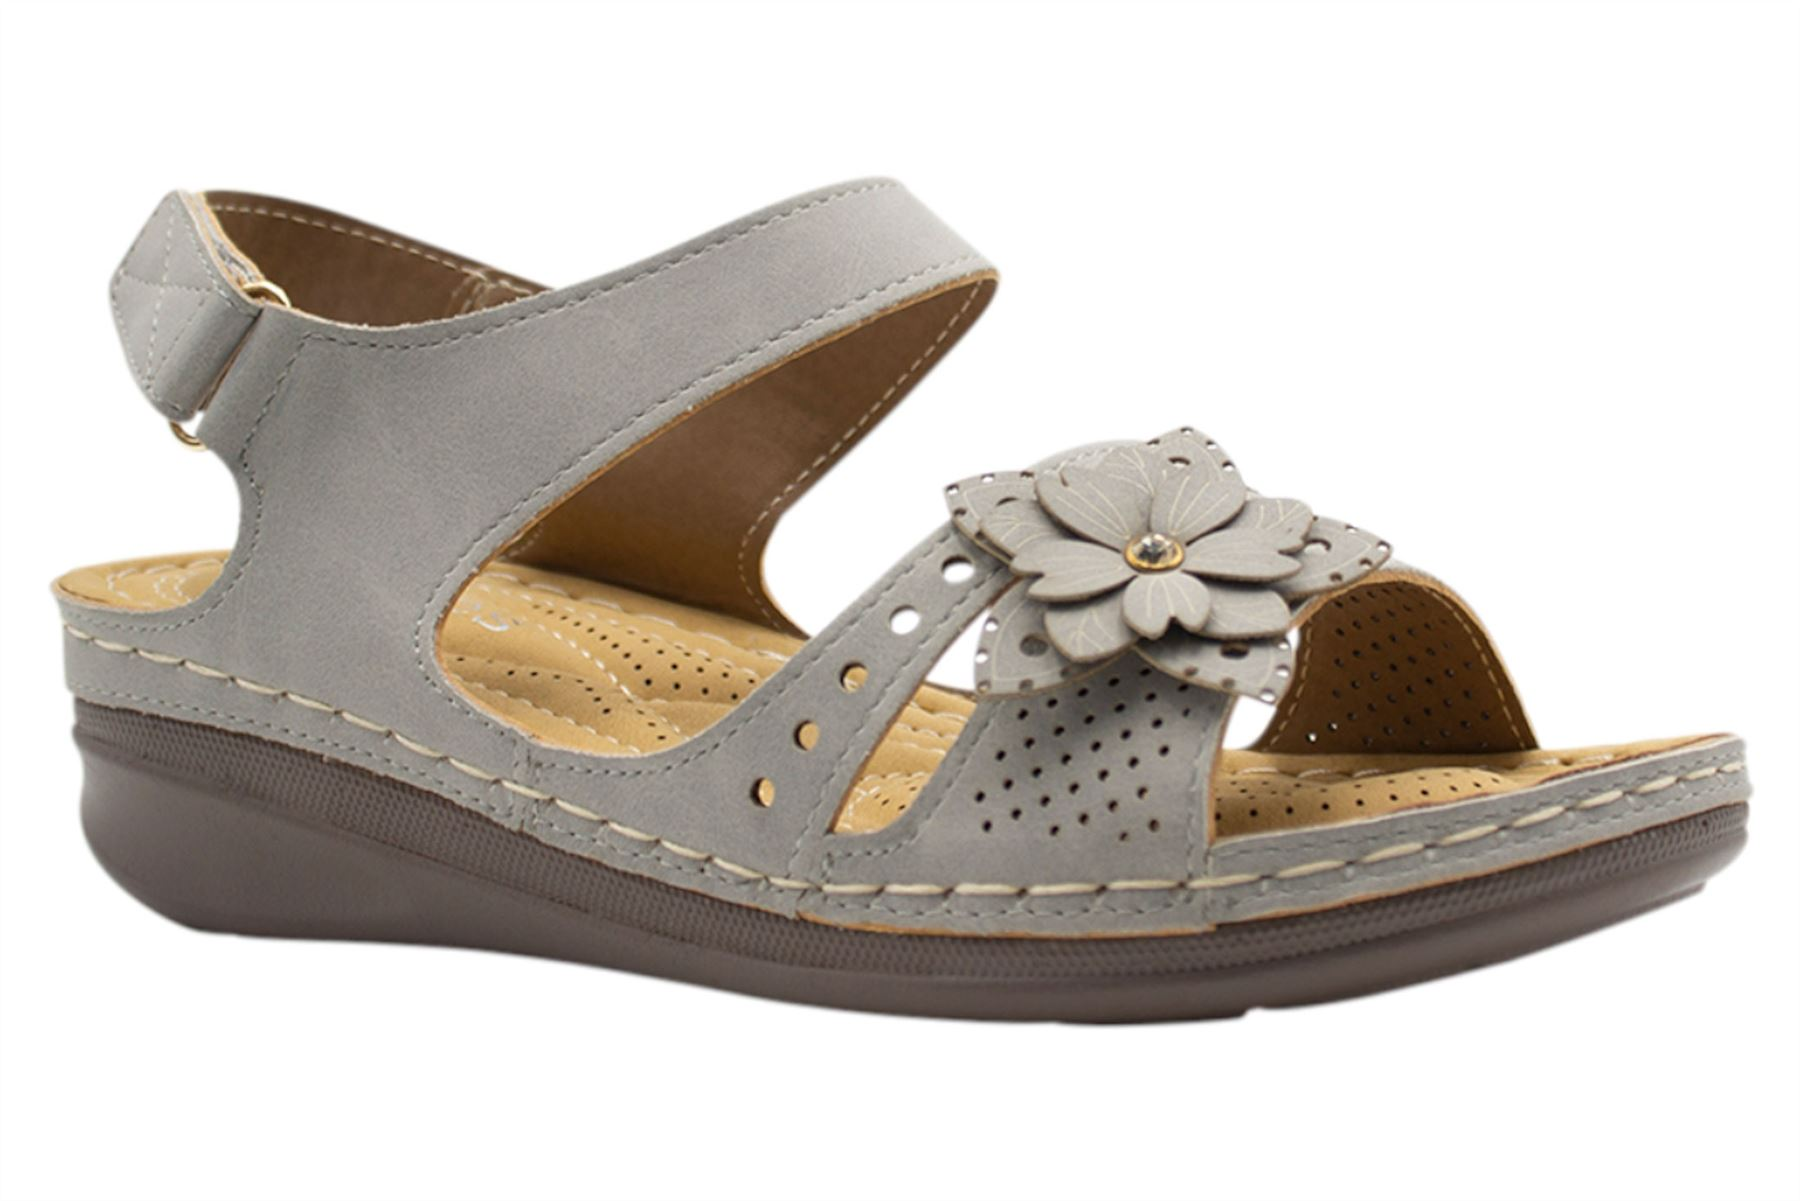 Ladies-Wedge-Heel-Sandal-Womens-Comfort-Cushion-Strapy-Summer-Shoes miniatura 22